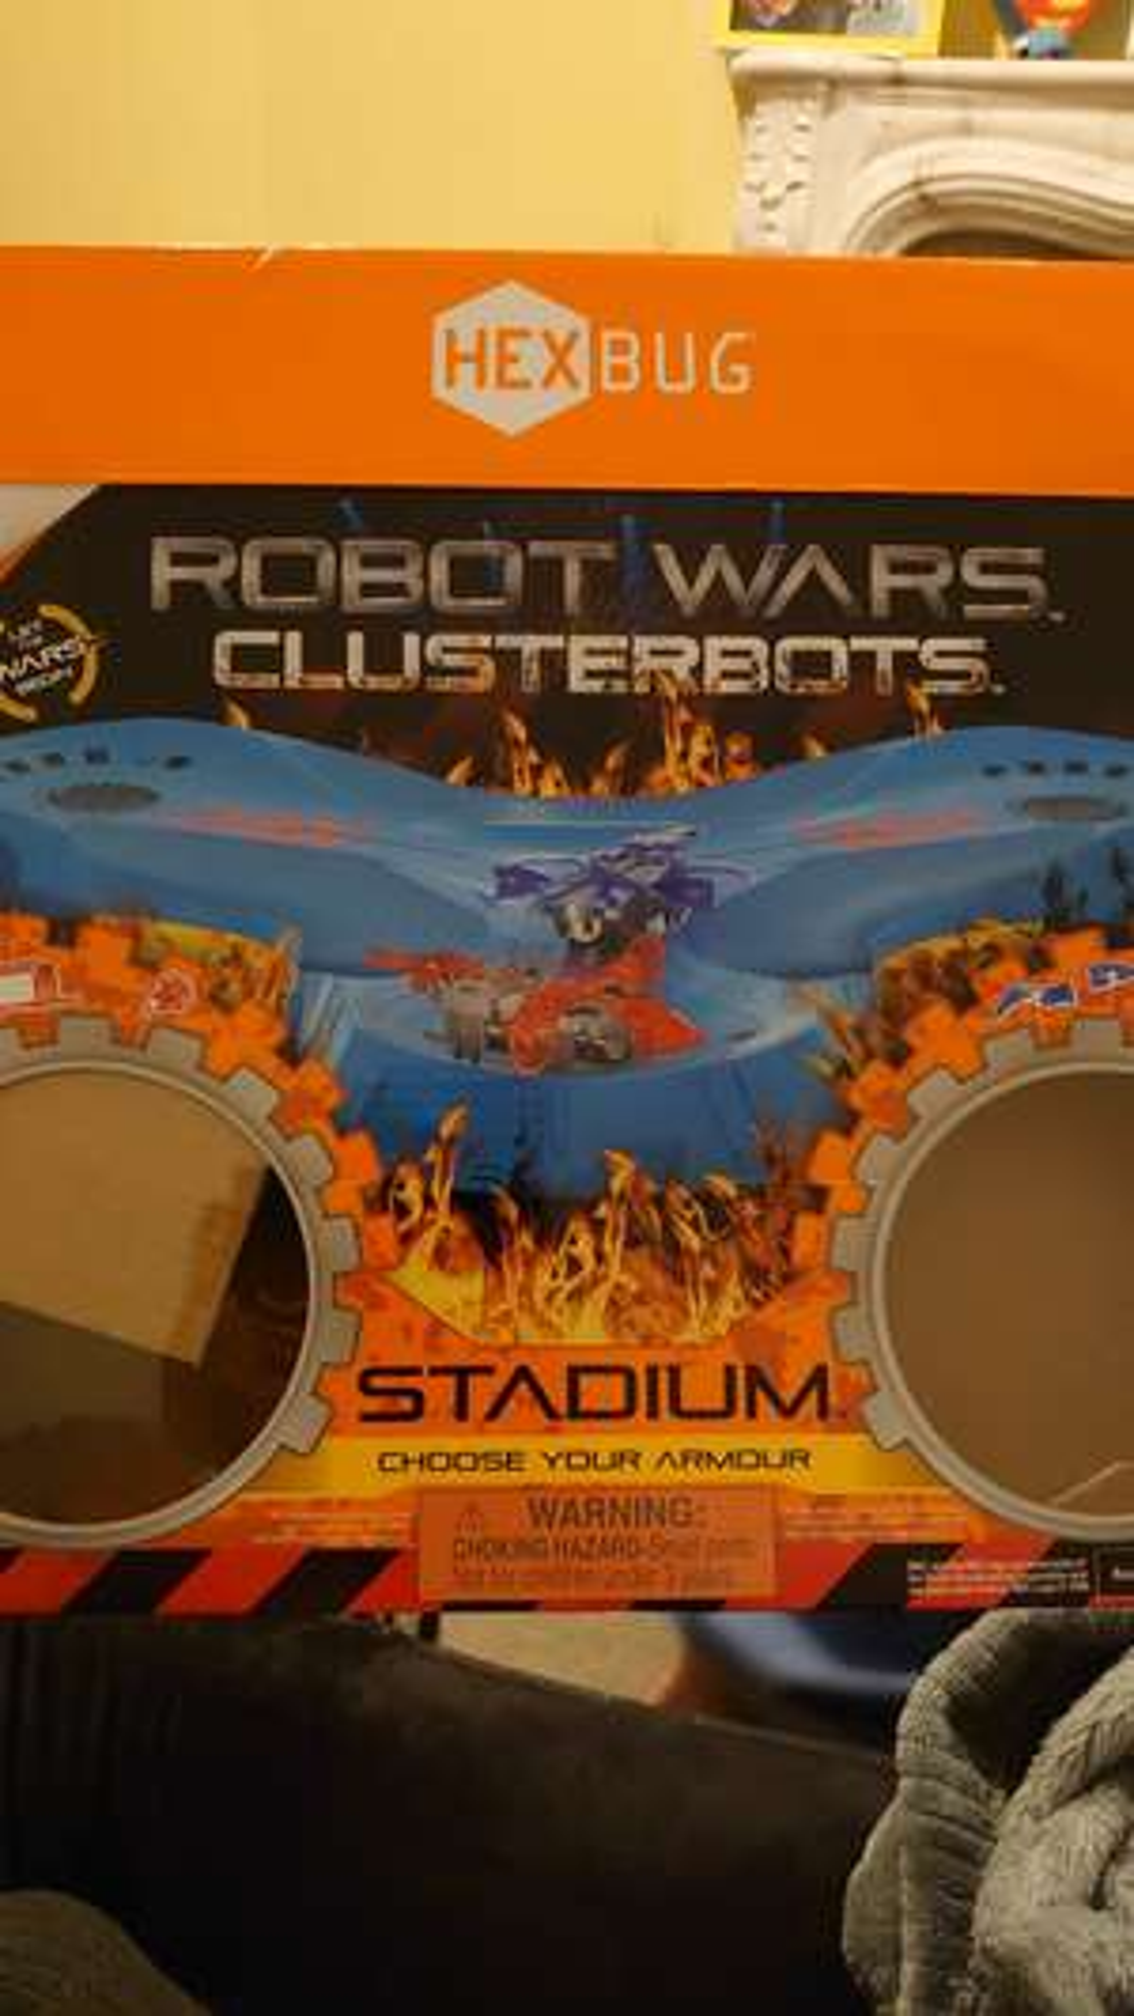 Robot wars stadium with 2 hexbug bots £5 @ The entertainer online / instore